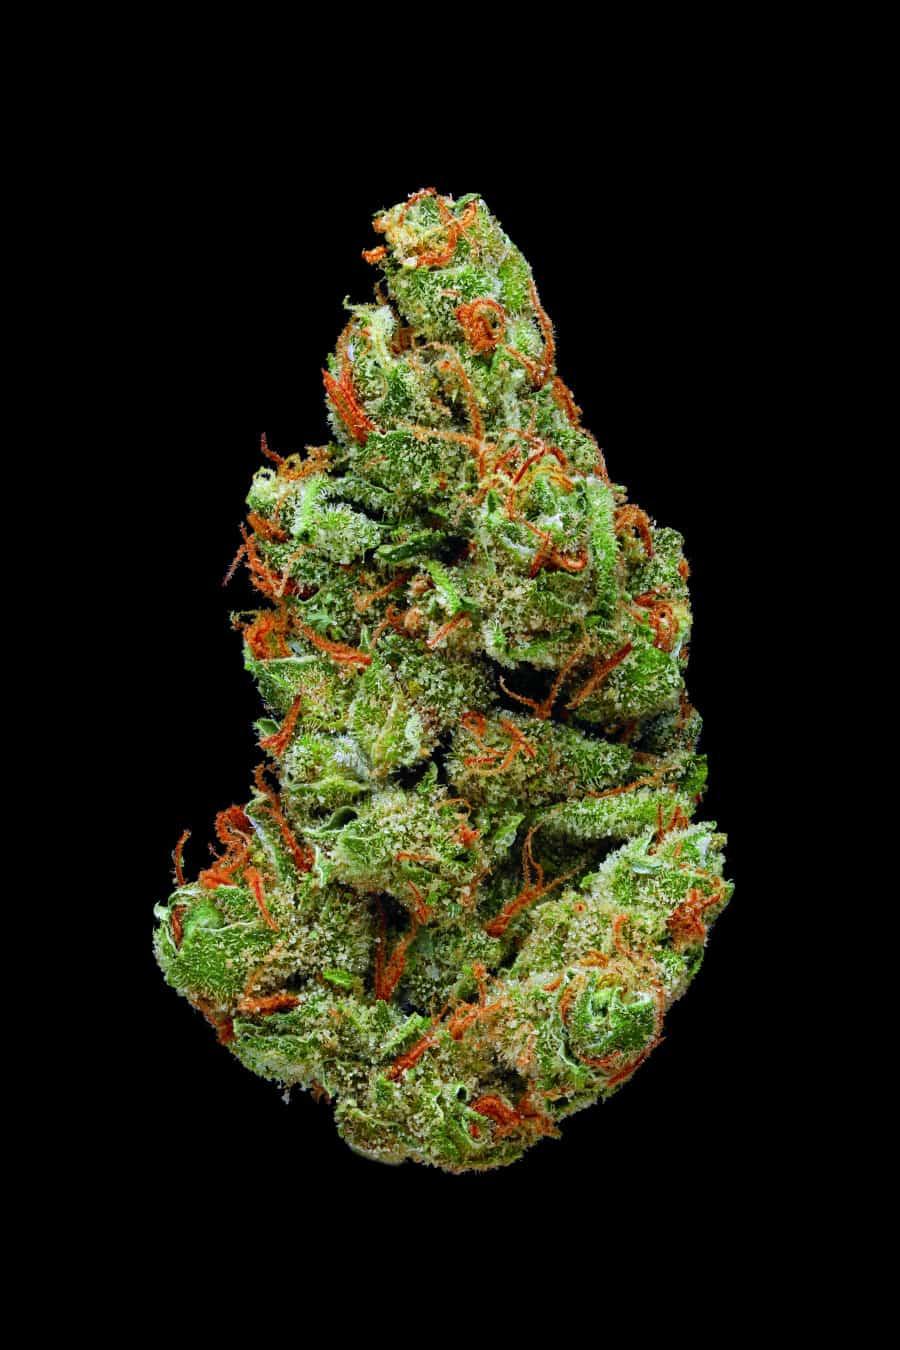 Credit: (Green: A Field Guide to Marijuana)